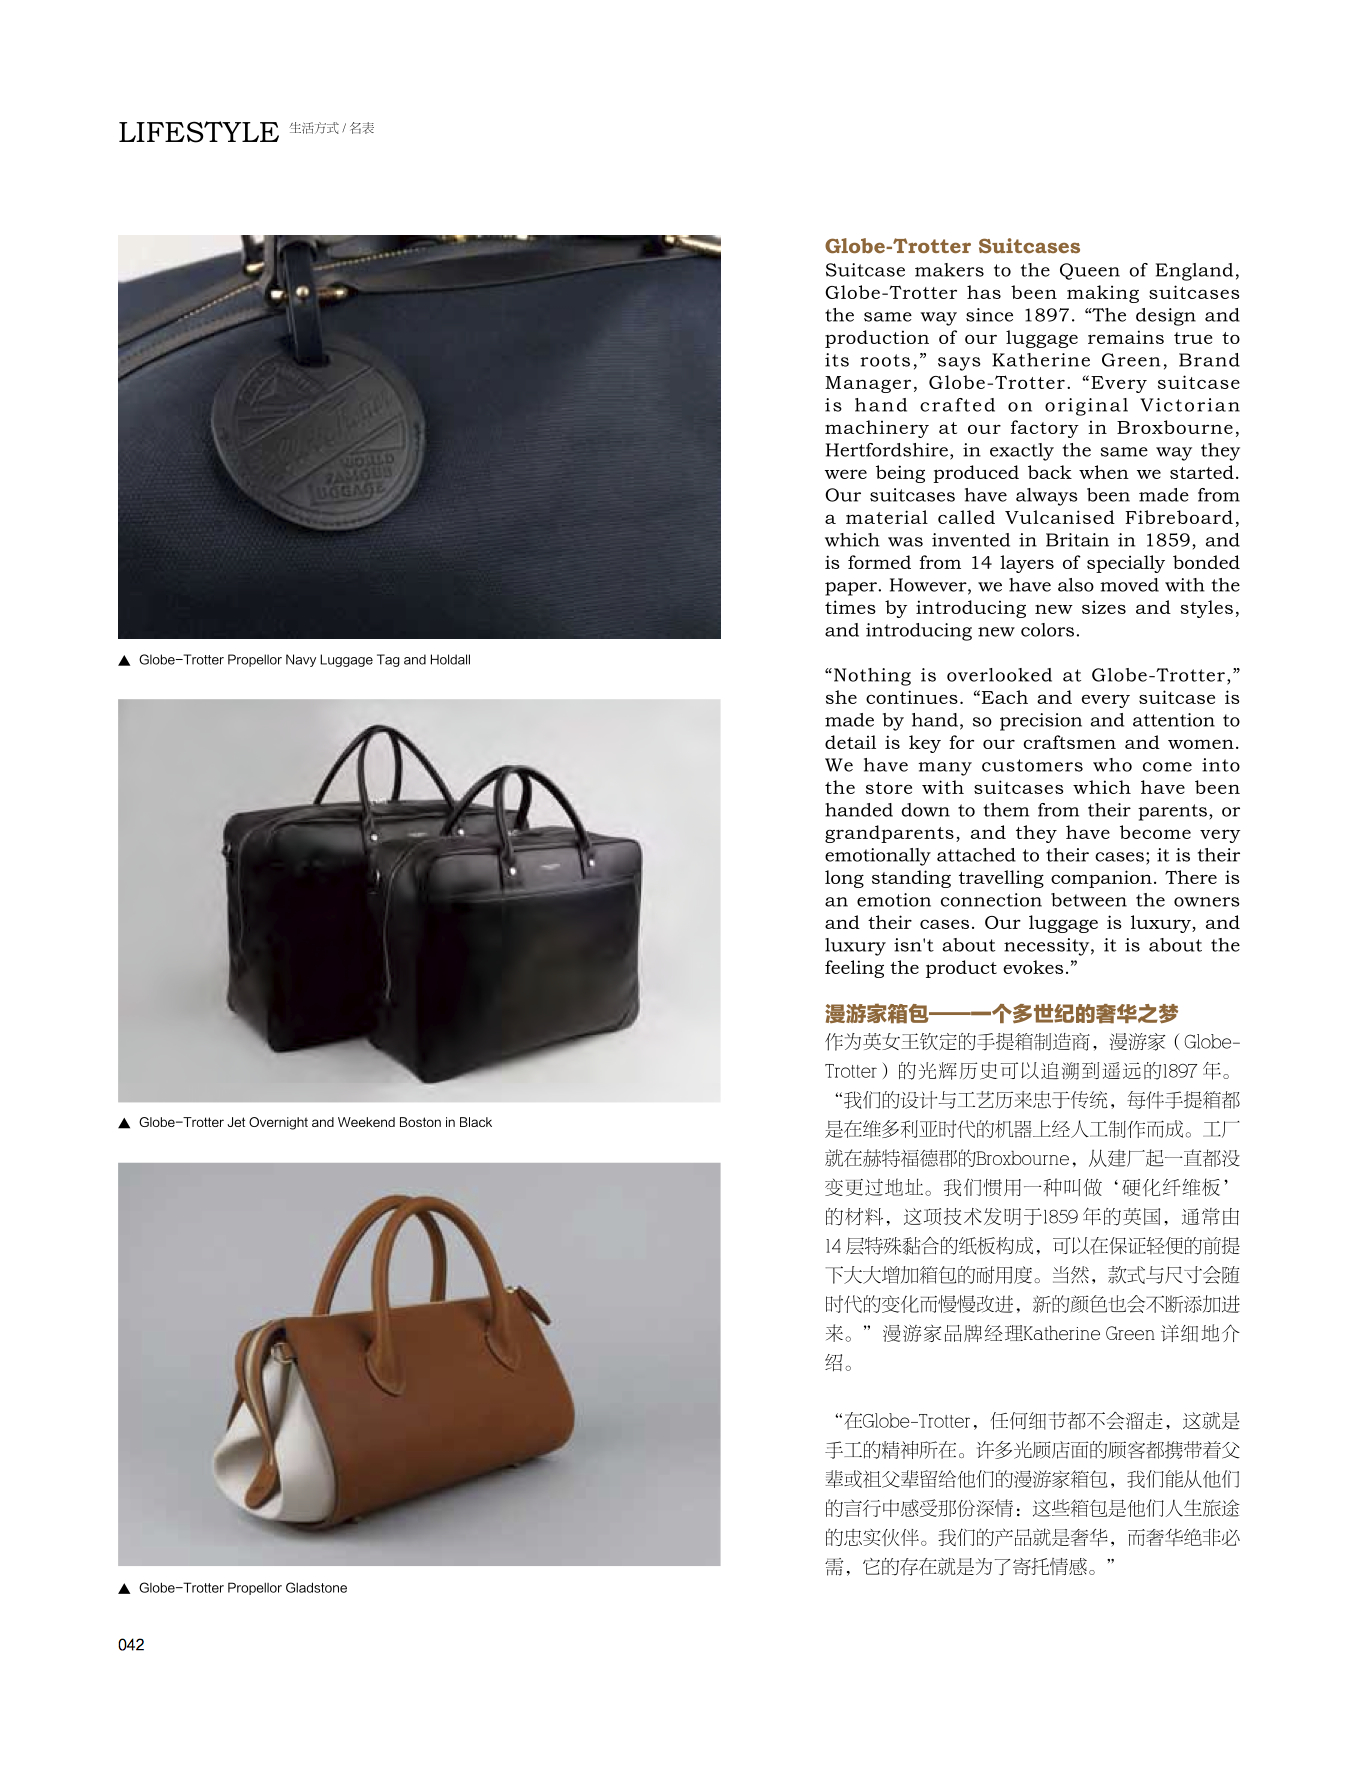 Fortune Character Magazine China October 2013.jpg